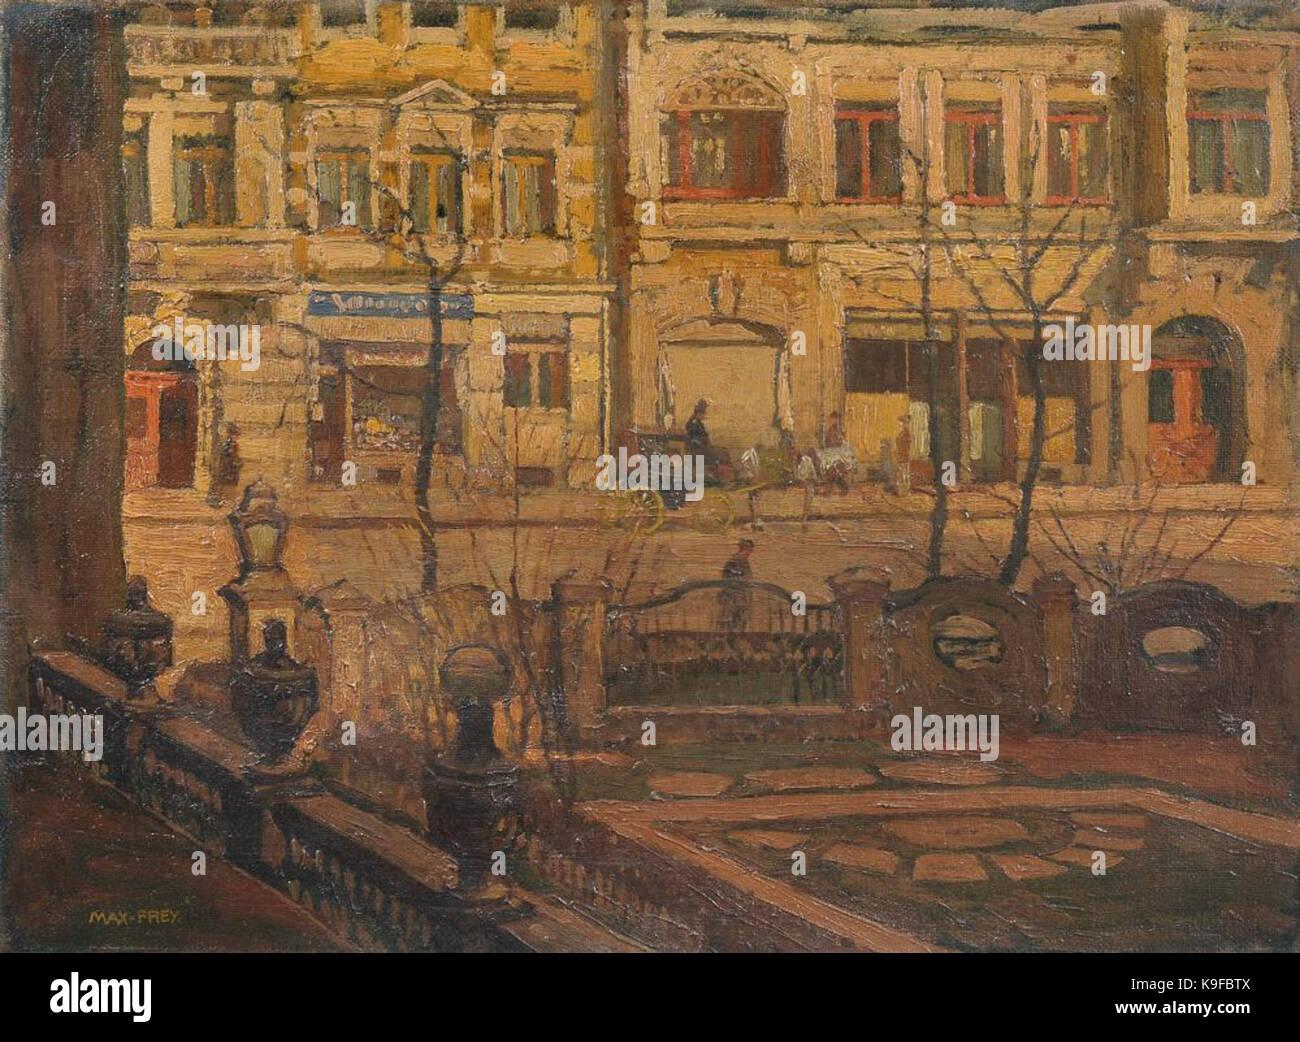 Max Frey Blick aus dem Fenster der Kunstgewerbeschule in Dresden, 1914 Stock Photo